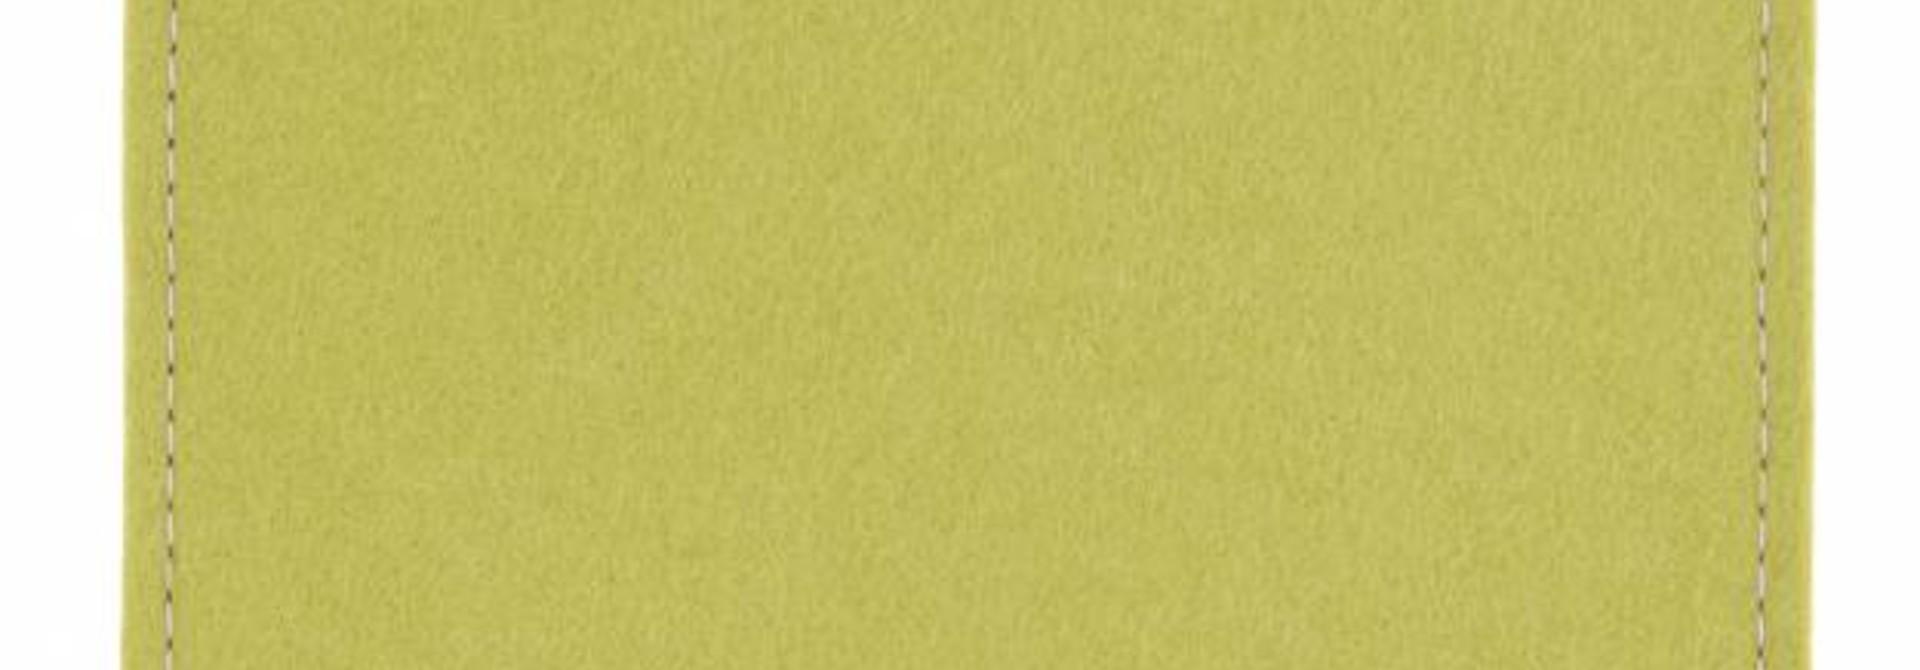 Pad/Tab Sleeve Lime-Green